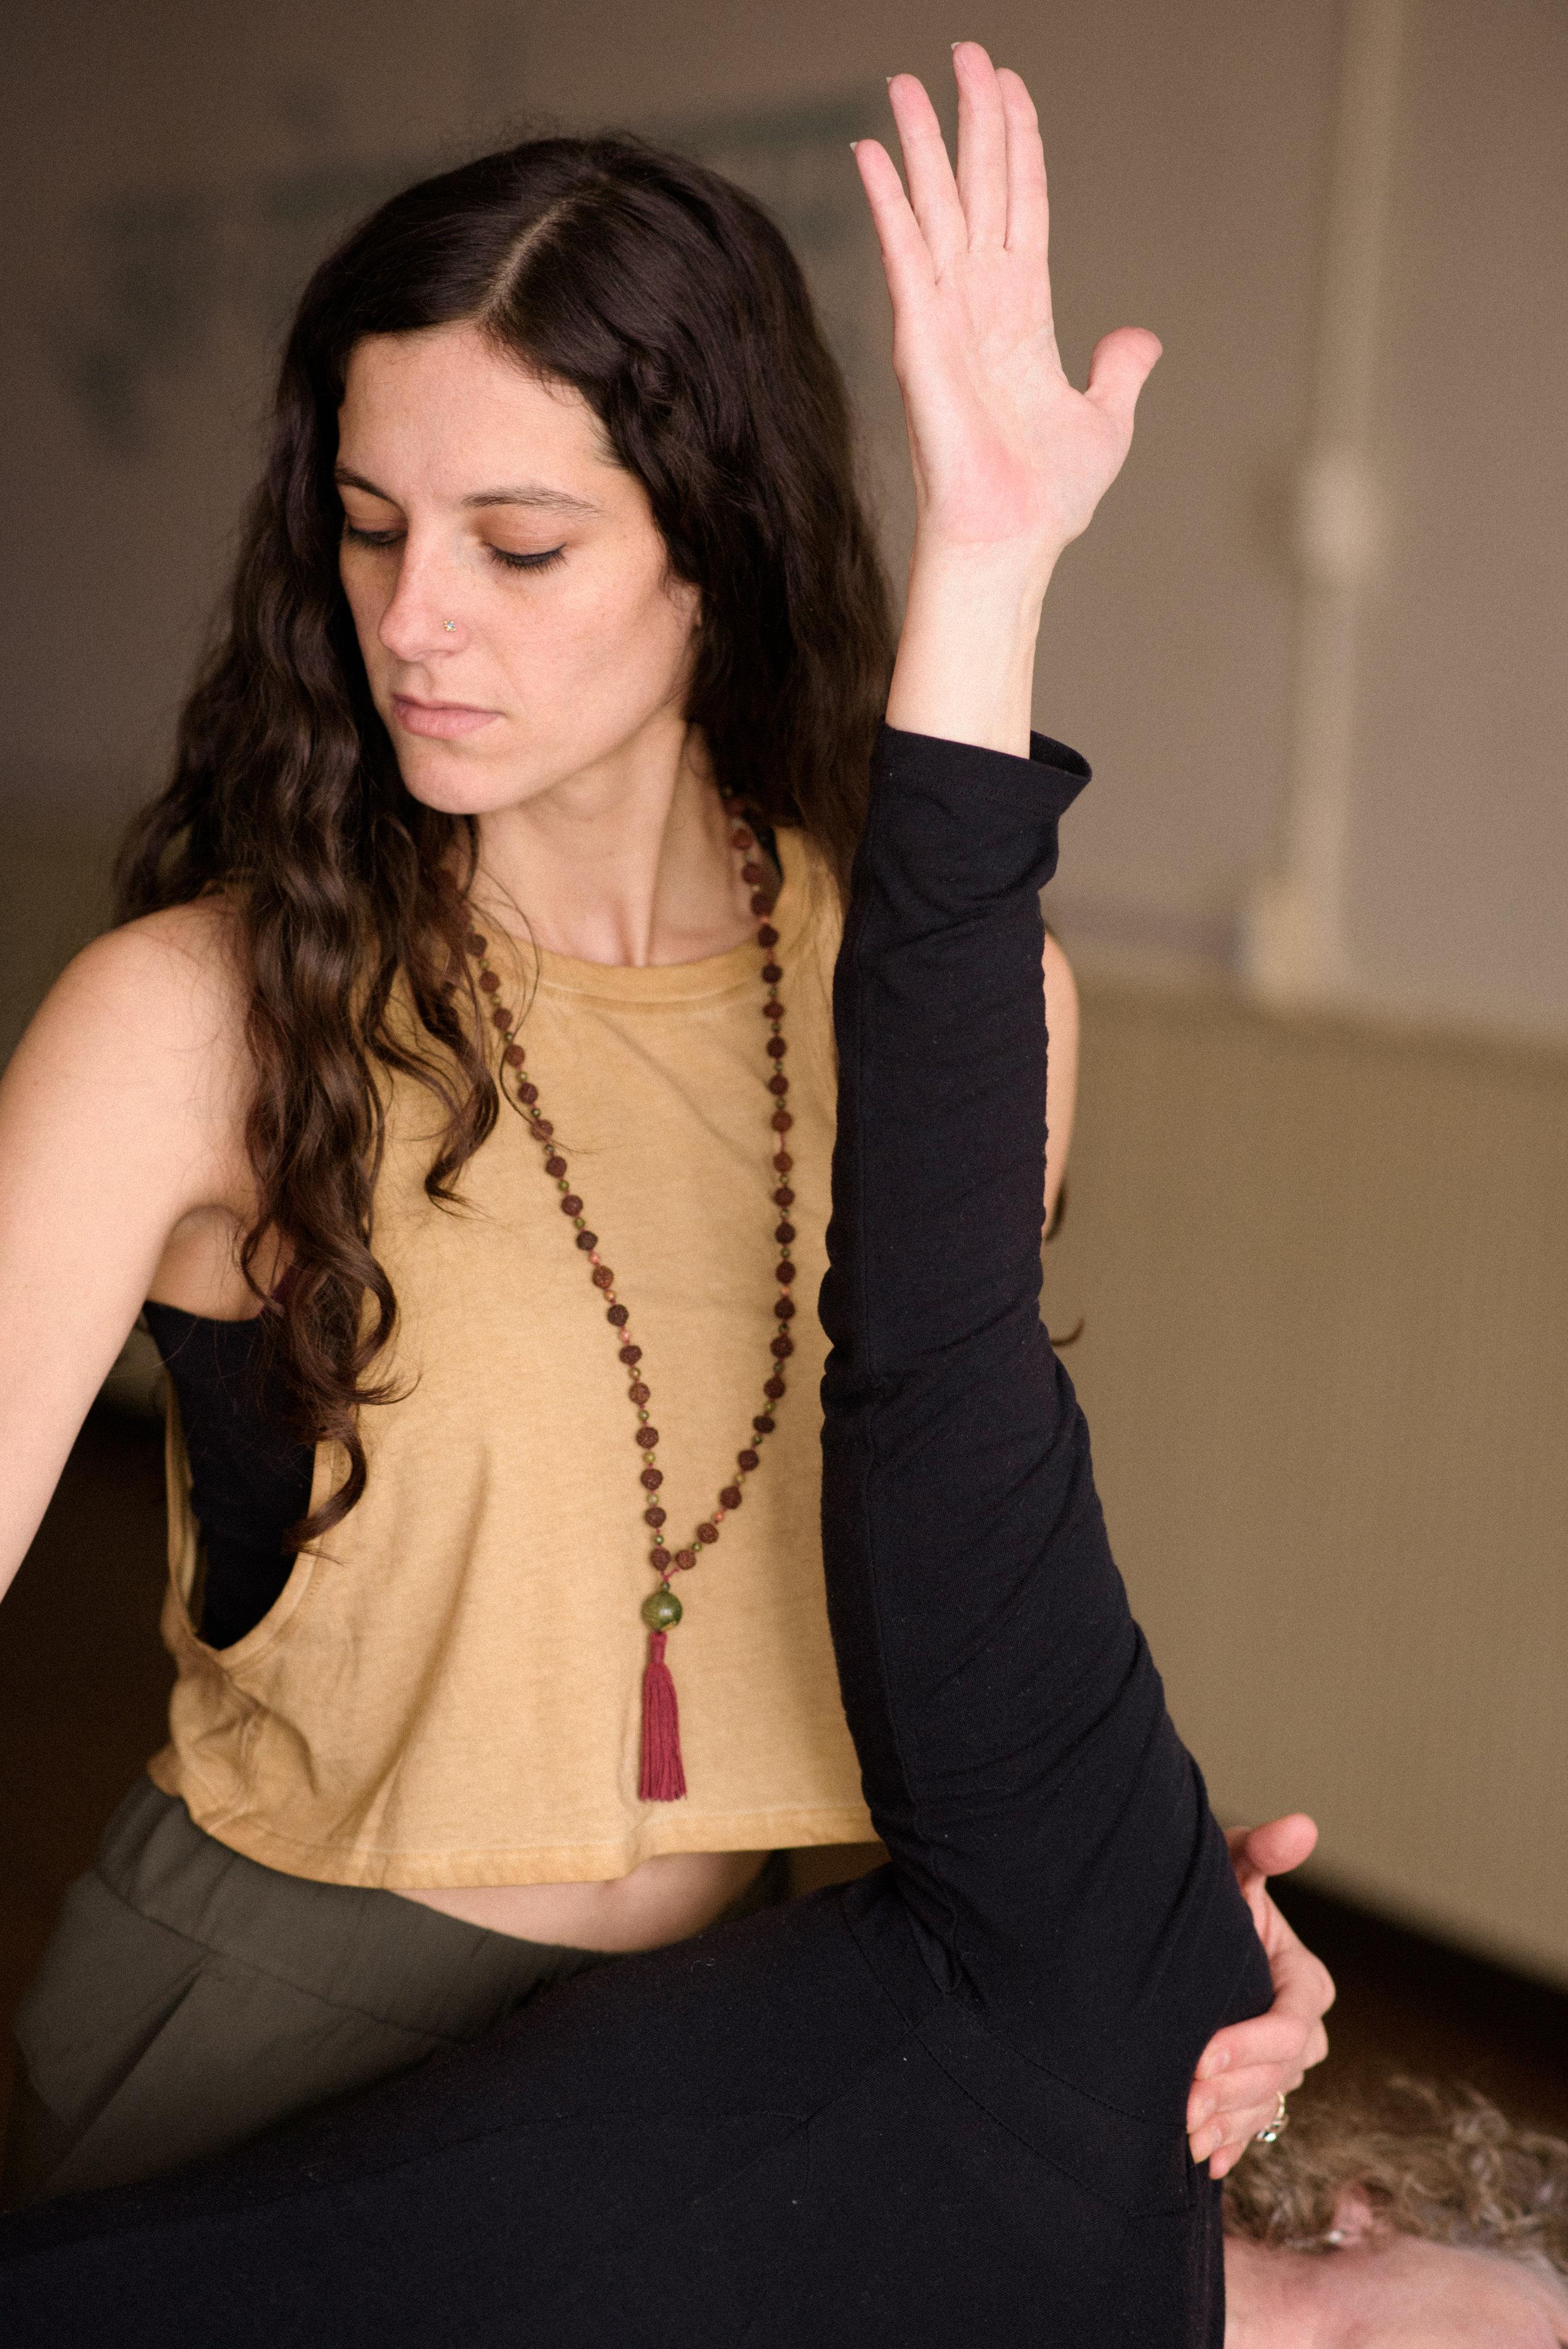 yogali-1904.jpg